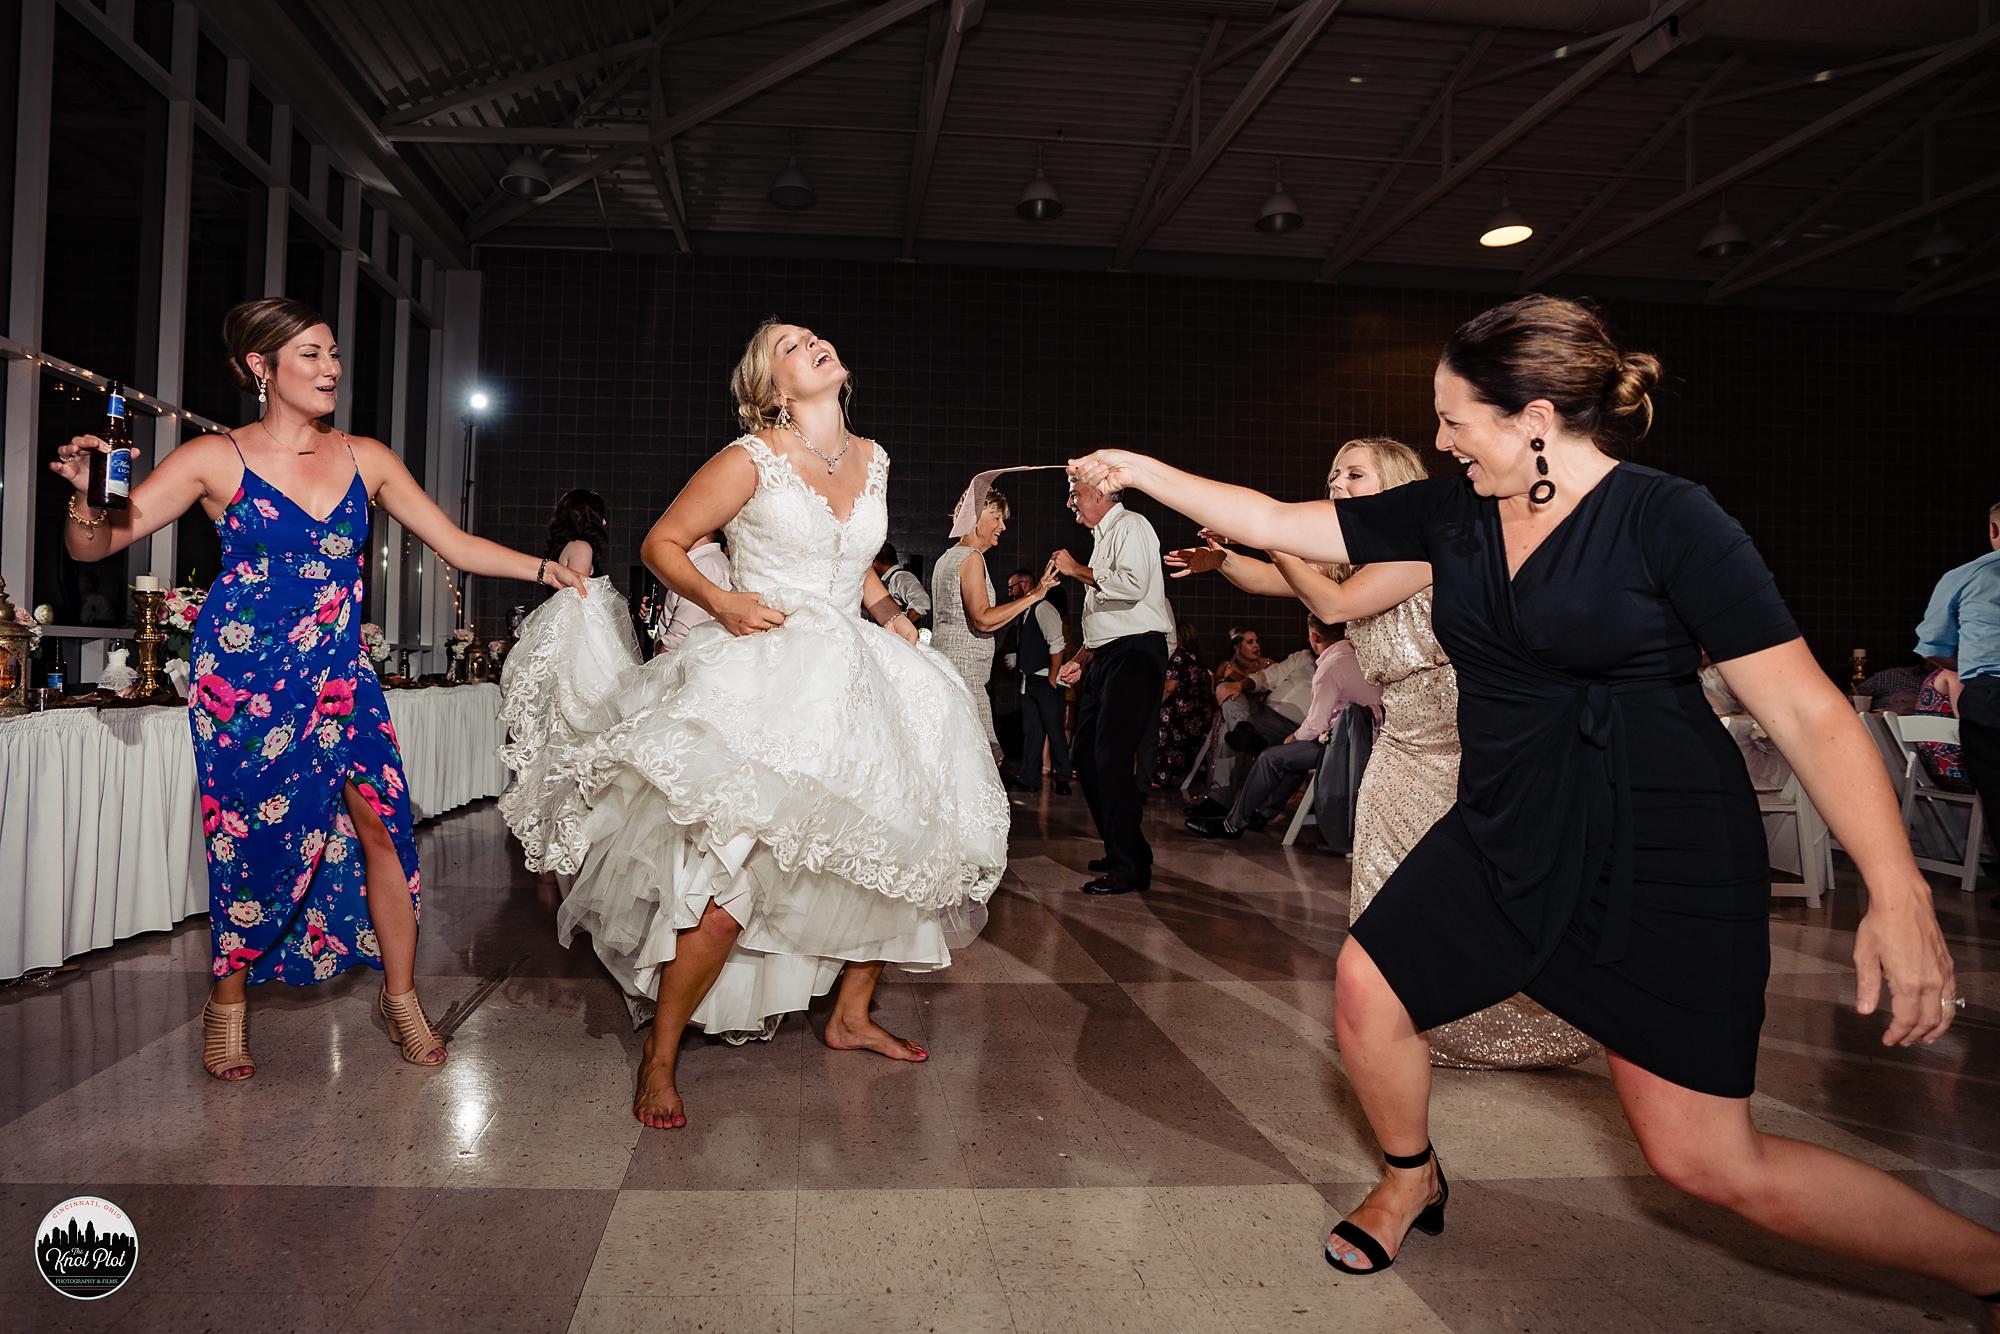 Southgate-Community-Center-KY-Wedding-Photography-33.jpg